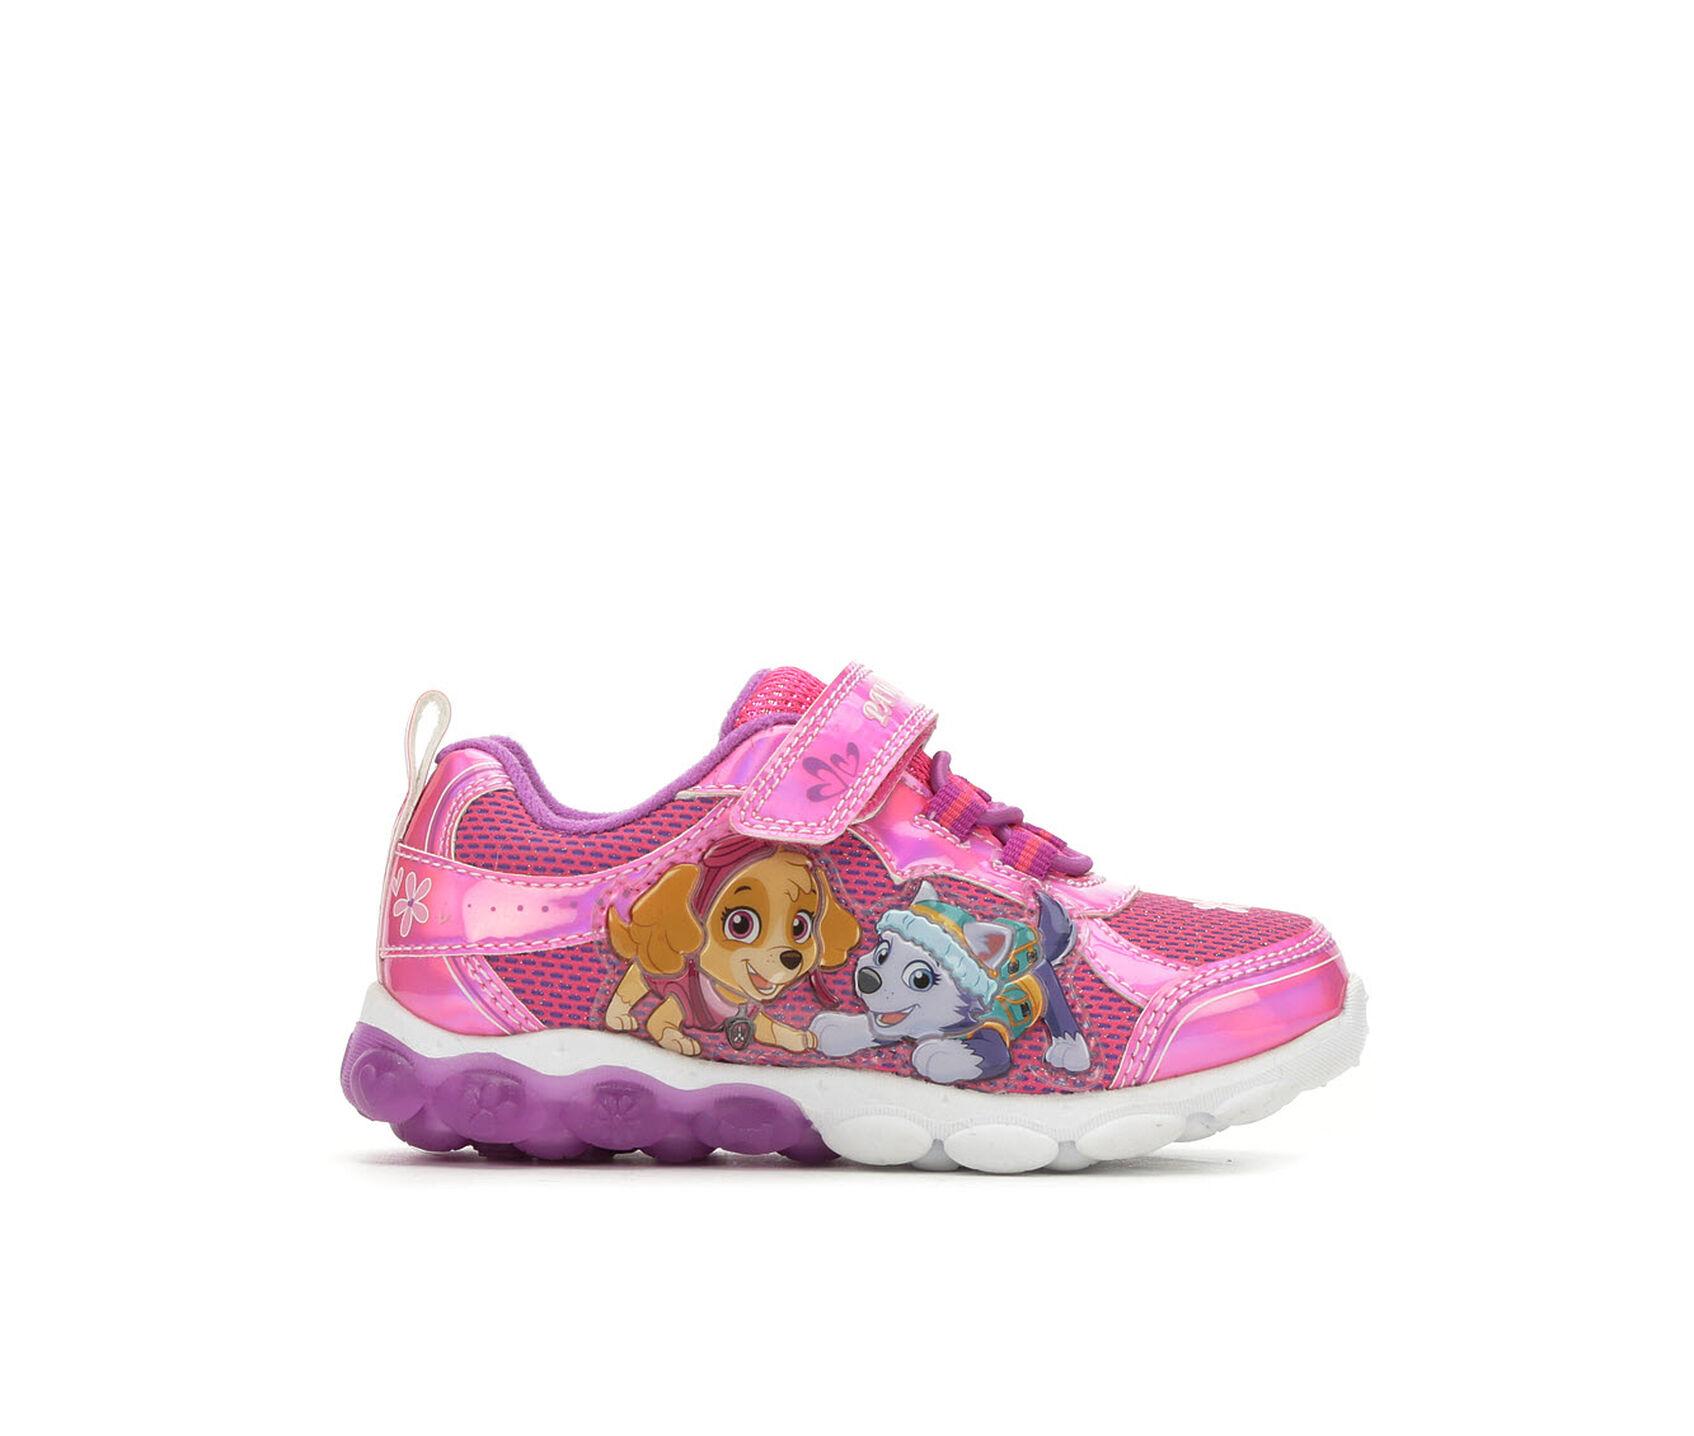 dd12d5b5bf63b Girls' Nickelodeon Toddler & Little Kid Paw Patrol 6 Light-Up Sneakers    Shoe Carnival